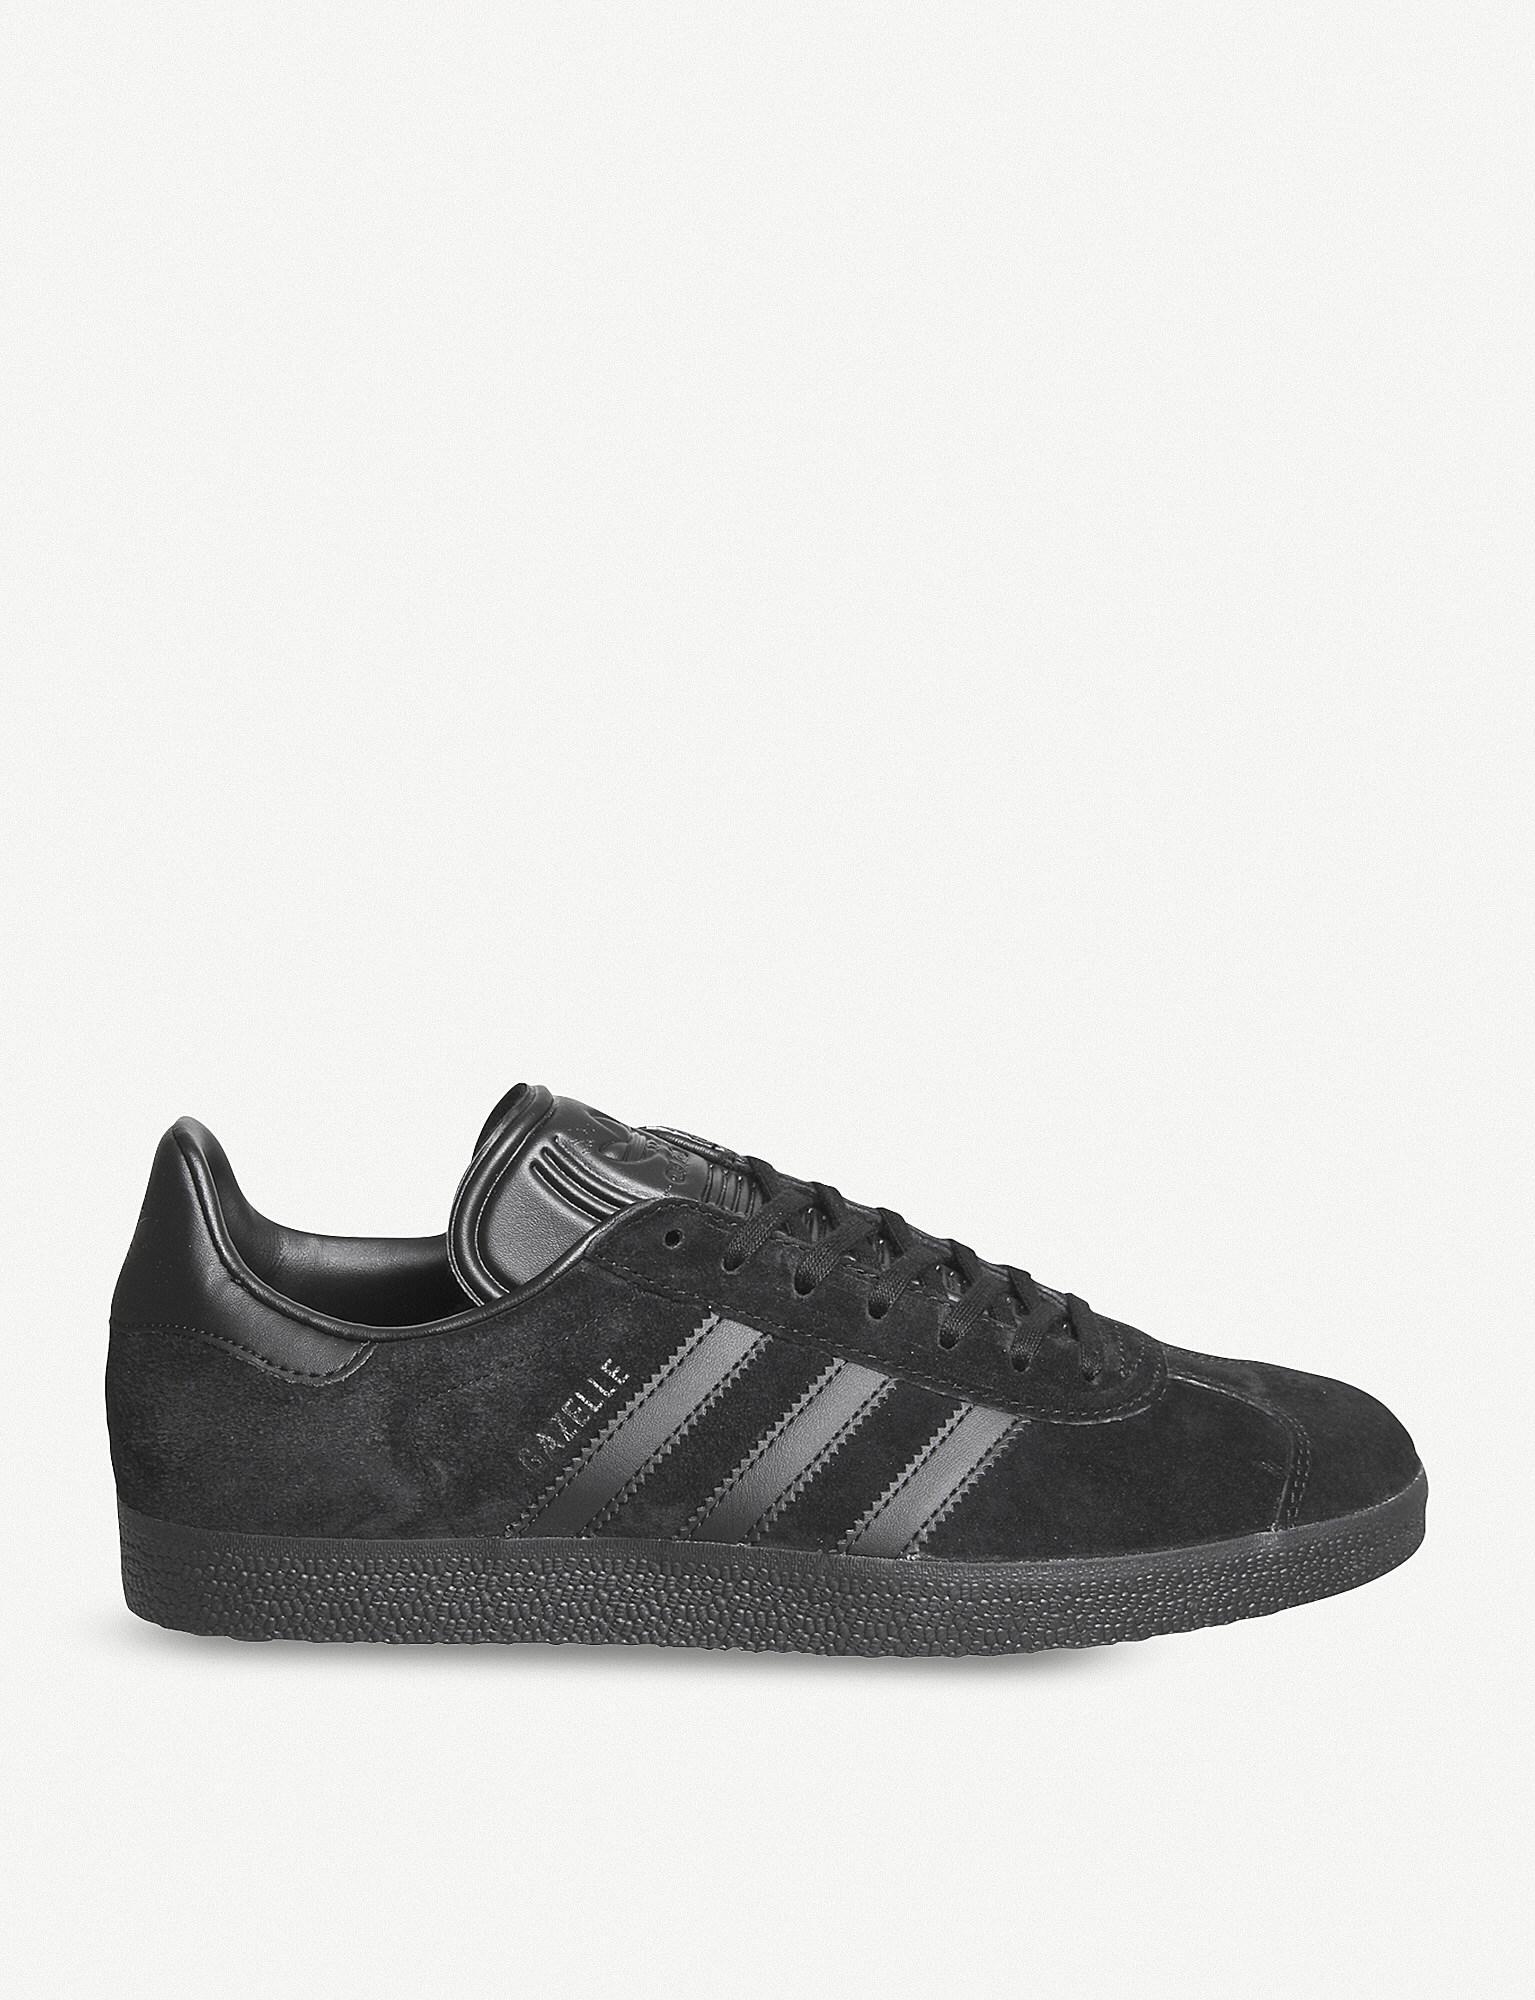 premium selection 23410 06c0f adidas. Mens Black Gazelle Suede Trainers